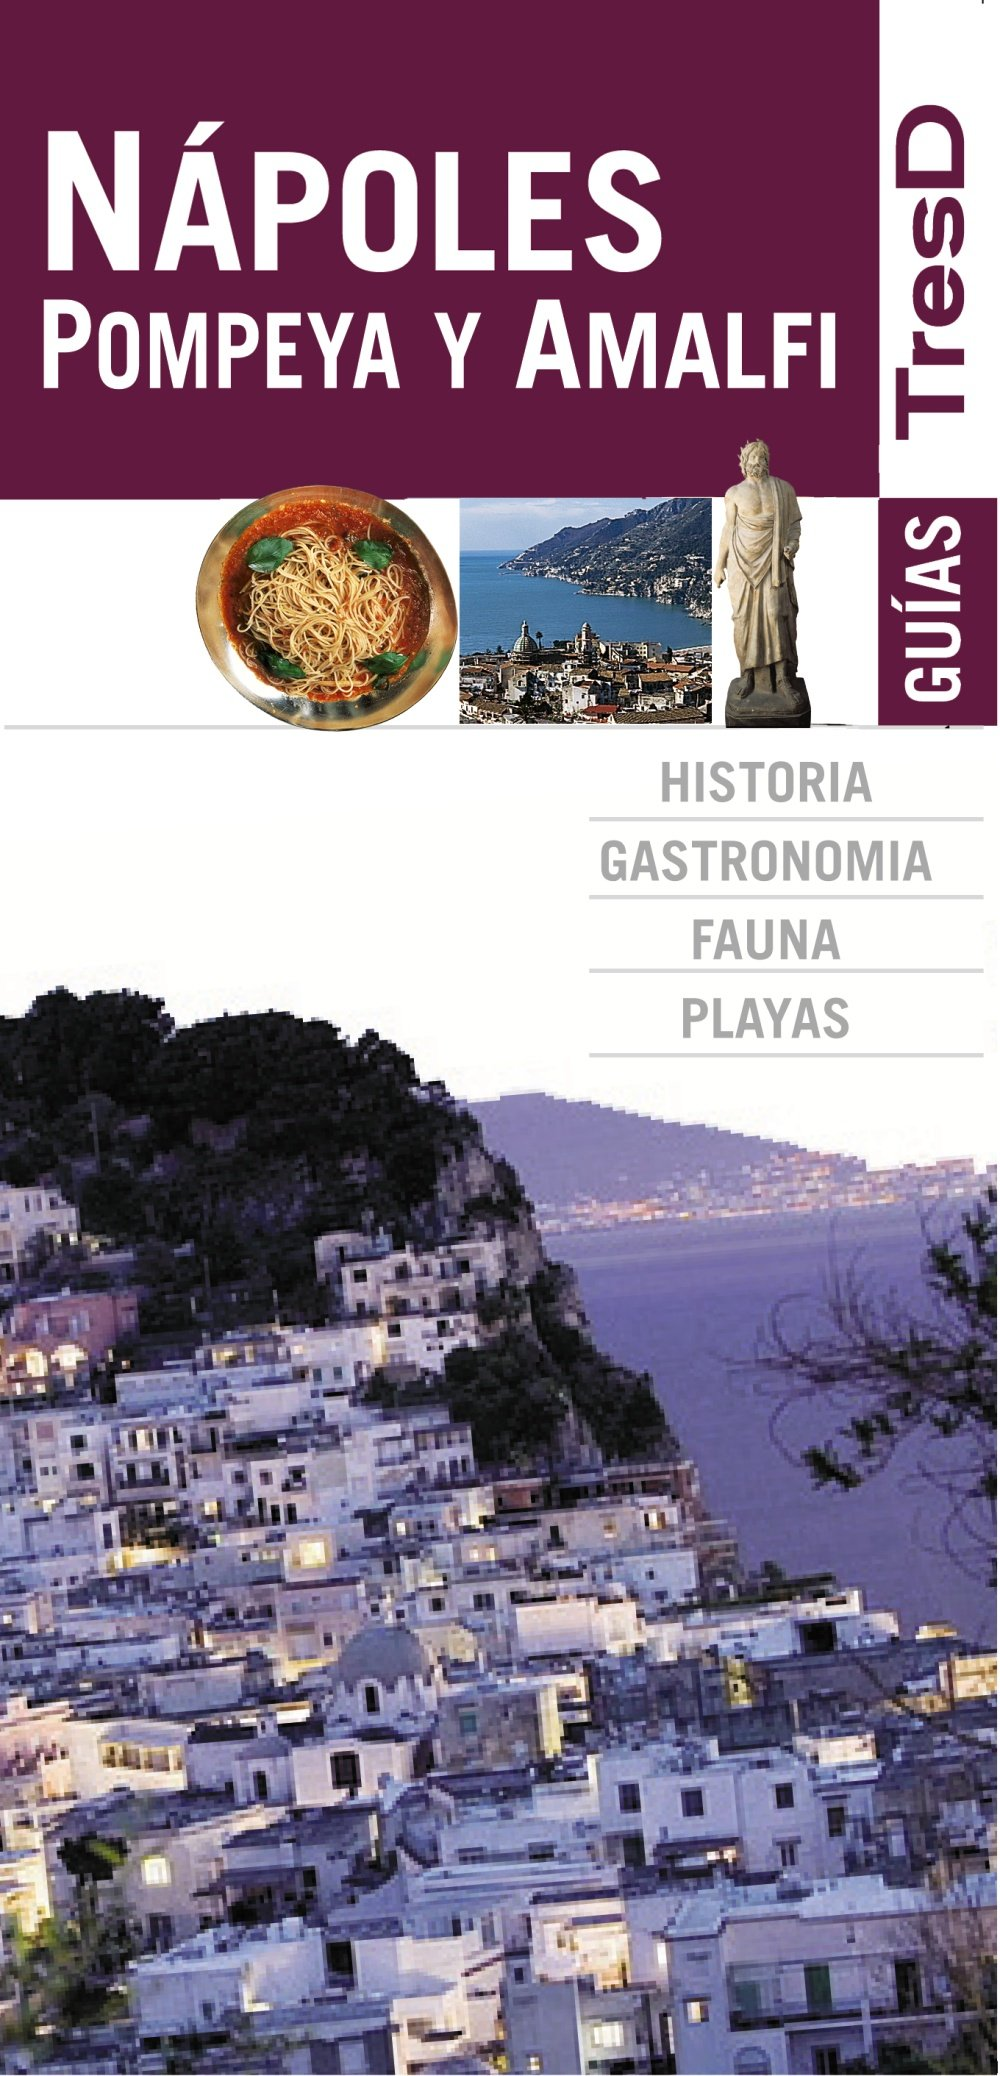 Nápoles, Pompeya y Amalfi / Naples, Pompeii and Amalfi (Guías Tresd / Guides Tresd) (Spanish Edition) ebook